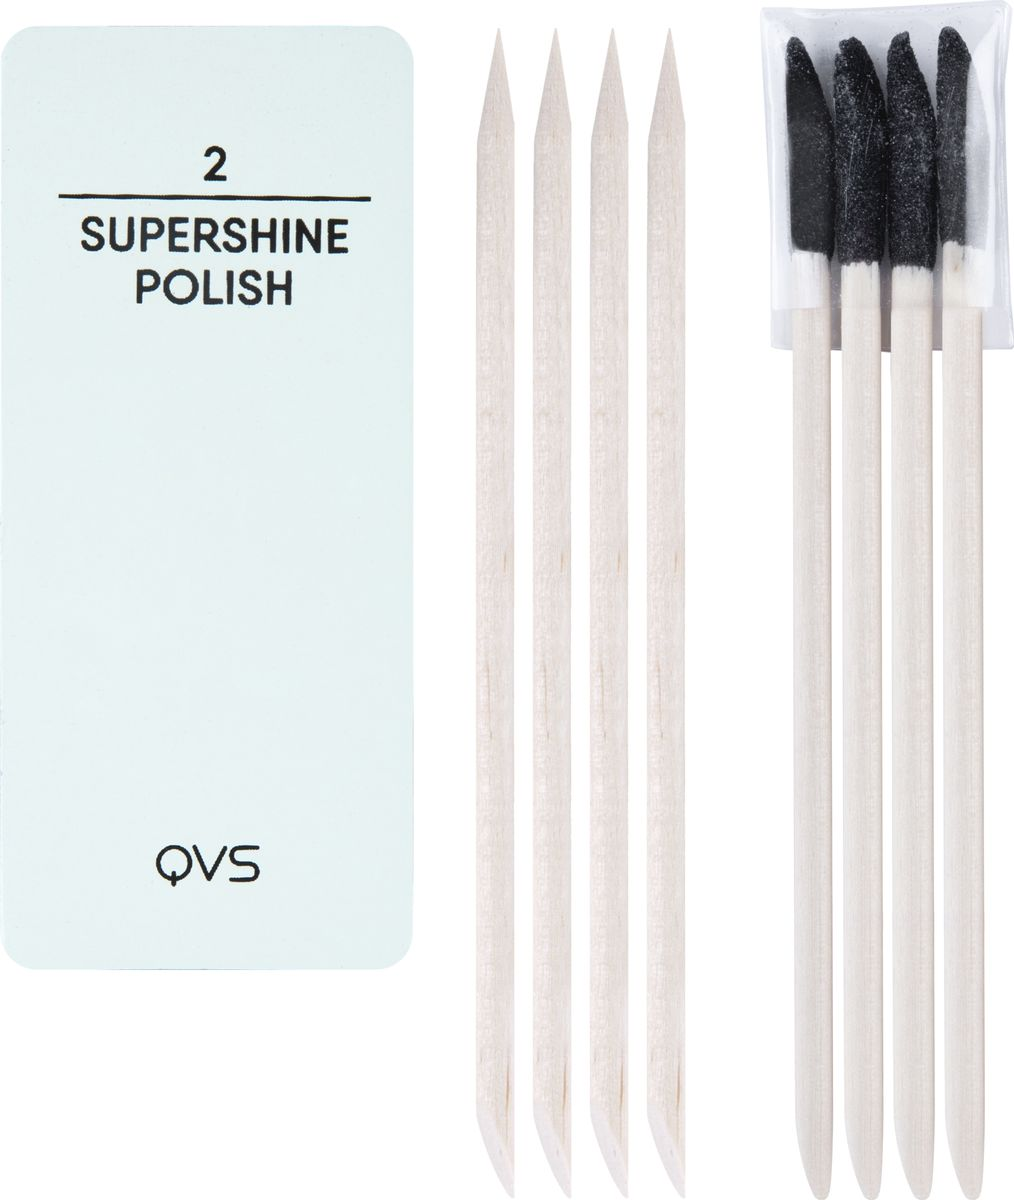 QVS Набор для ухода за ногтями и кутикулой (мини-баф/полировка, палочки для кутикулы). 82-10-1679